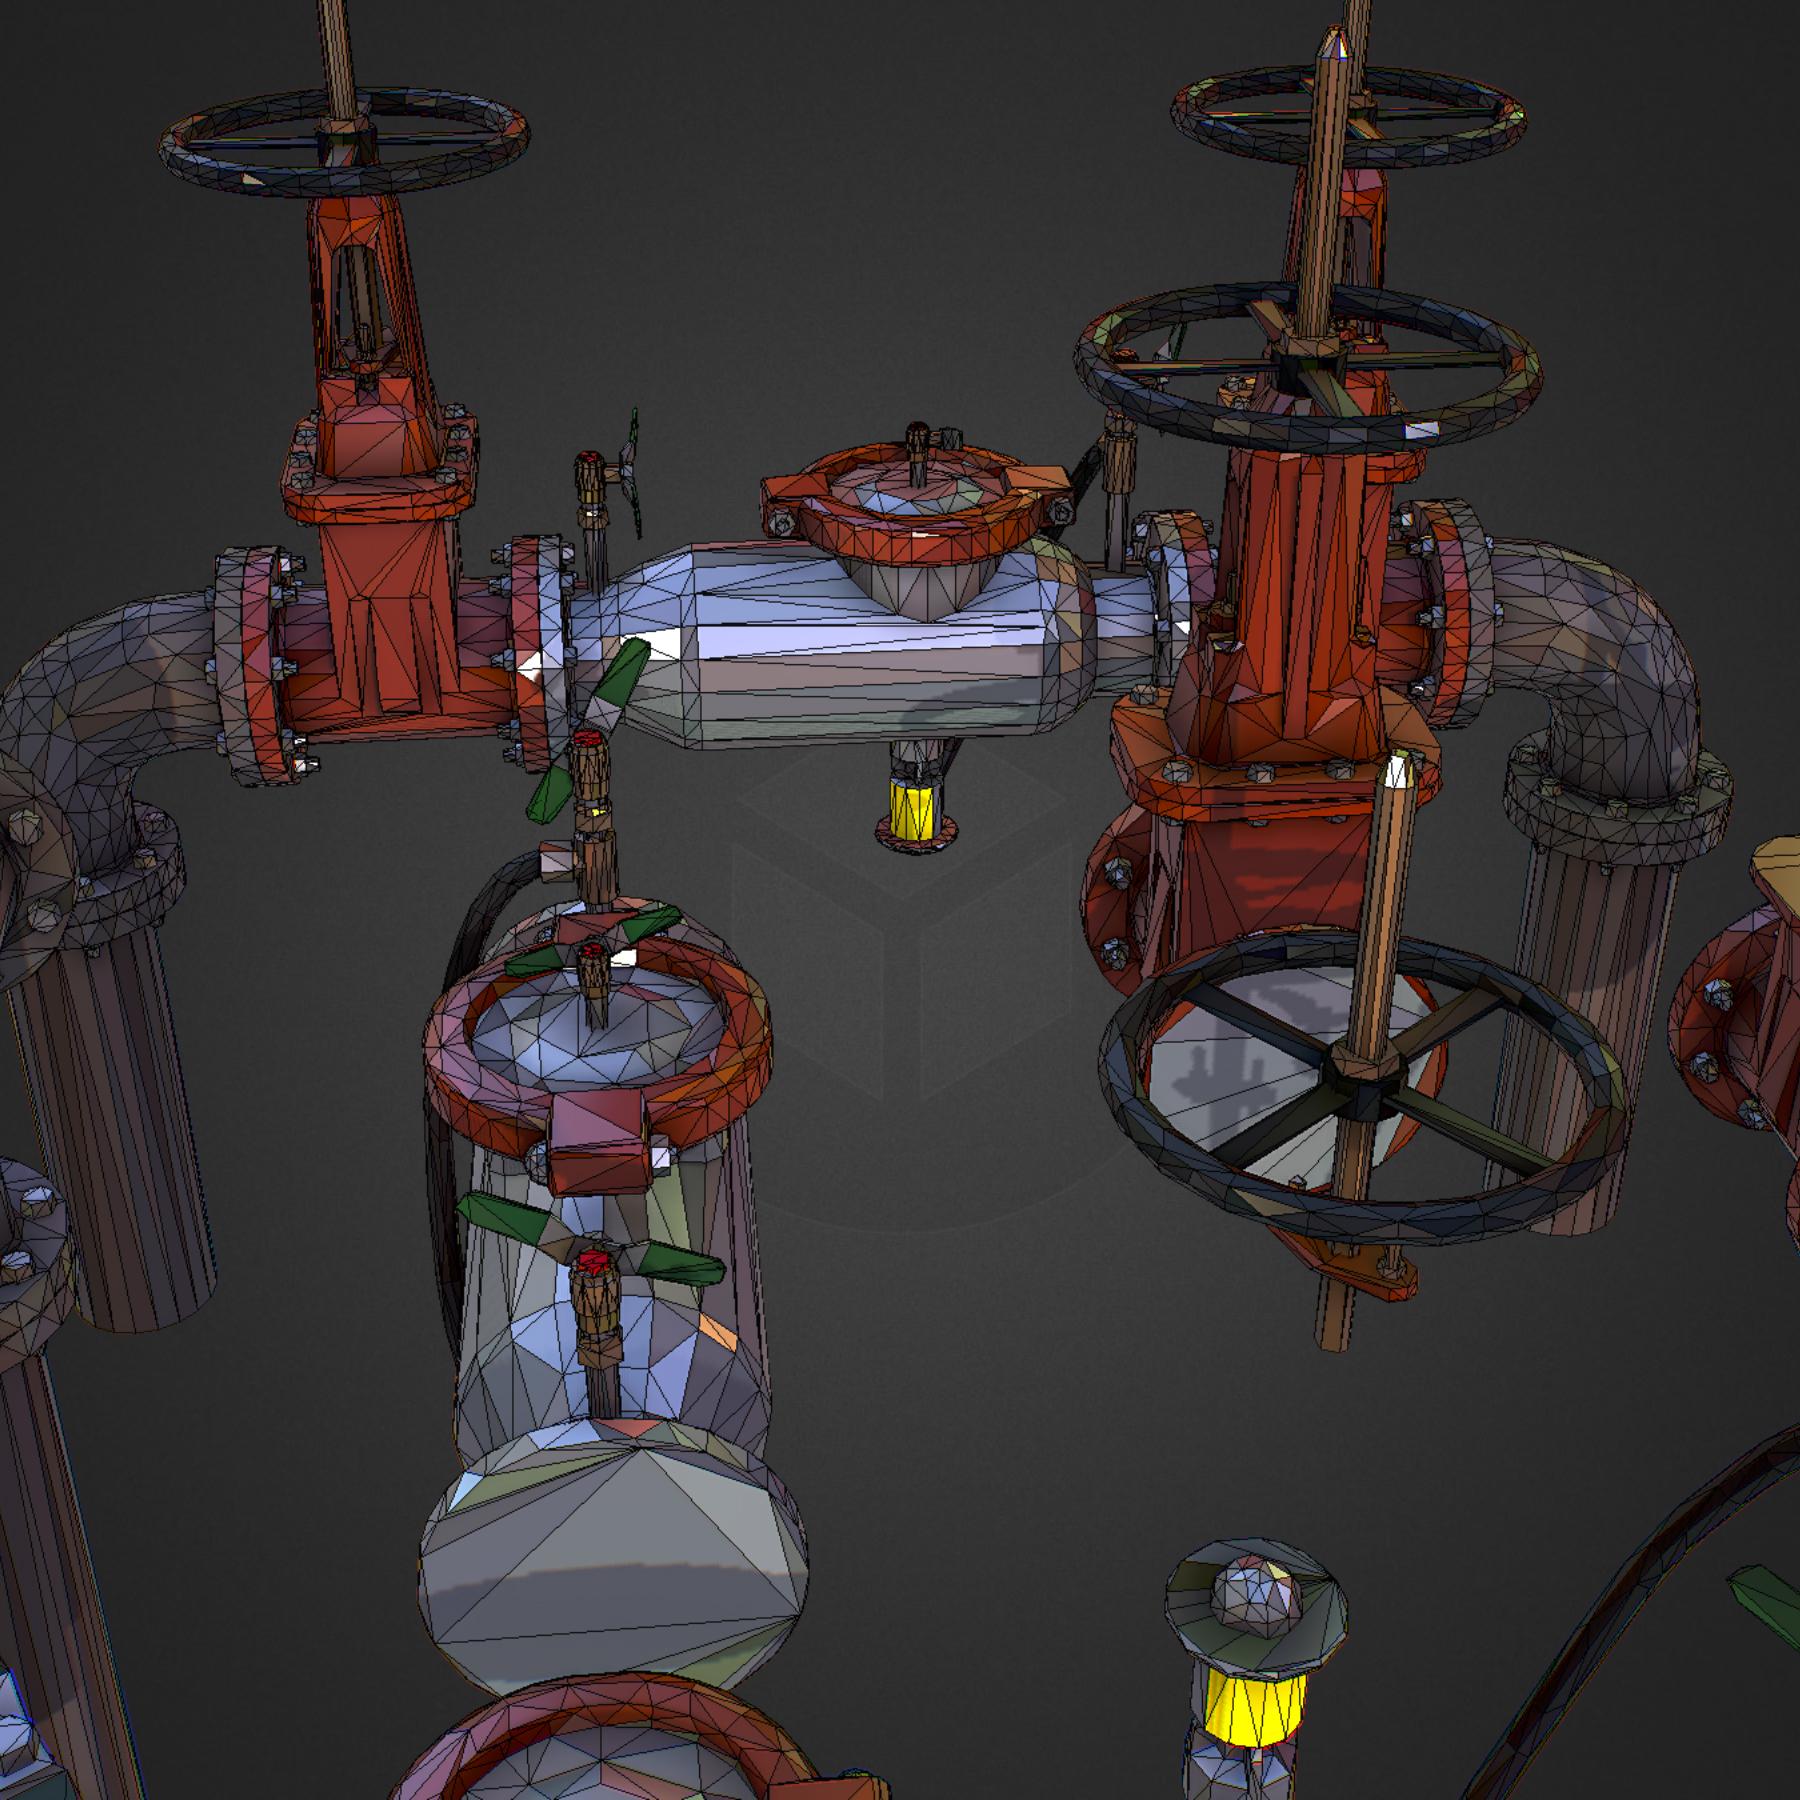 Low Poly ART Backflow Water Pipe Constructor 3d model max 3ds max plugin fbx ma mb tga targa icb vda vst pix obj 272570